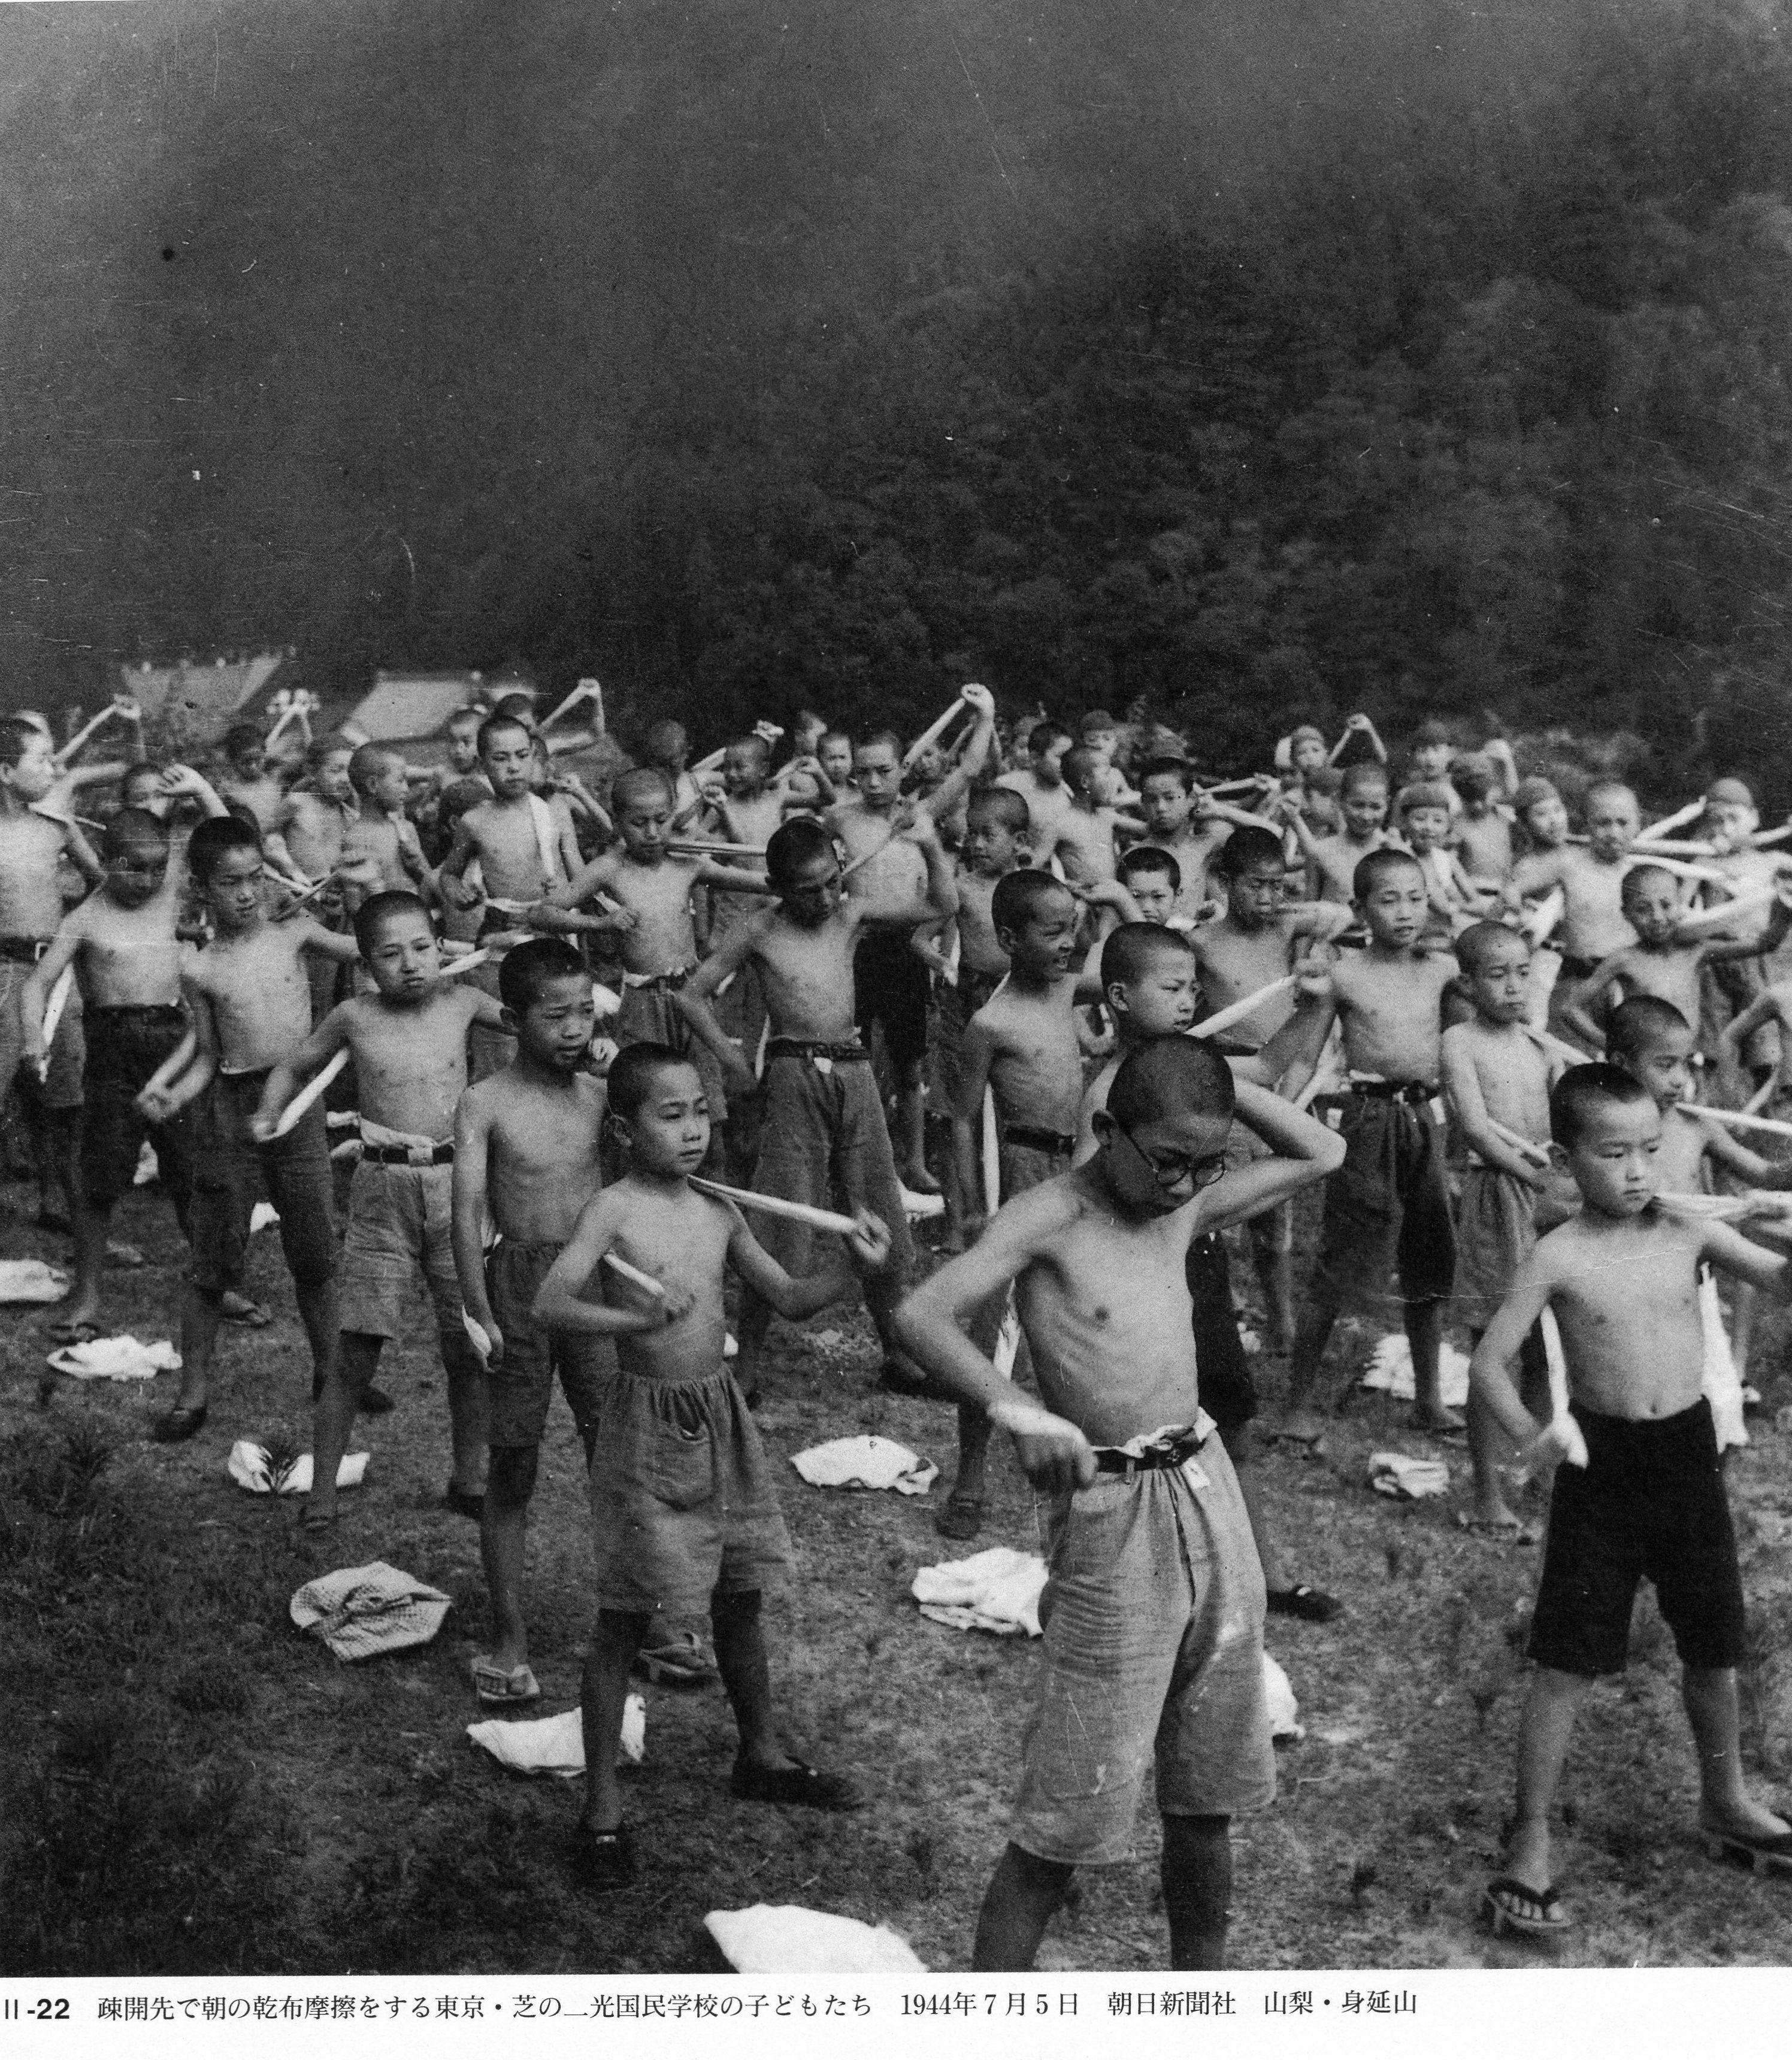 裸で乾布摩擦 疎開先で乾布摩擦する東京の生徒。1944.7.5